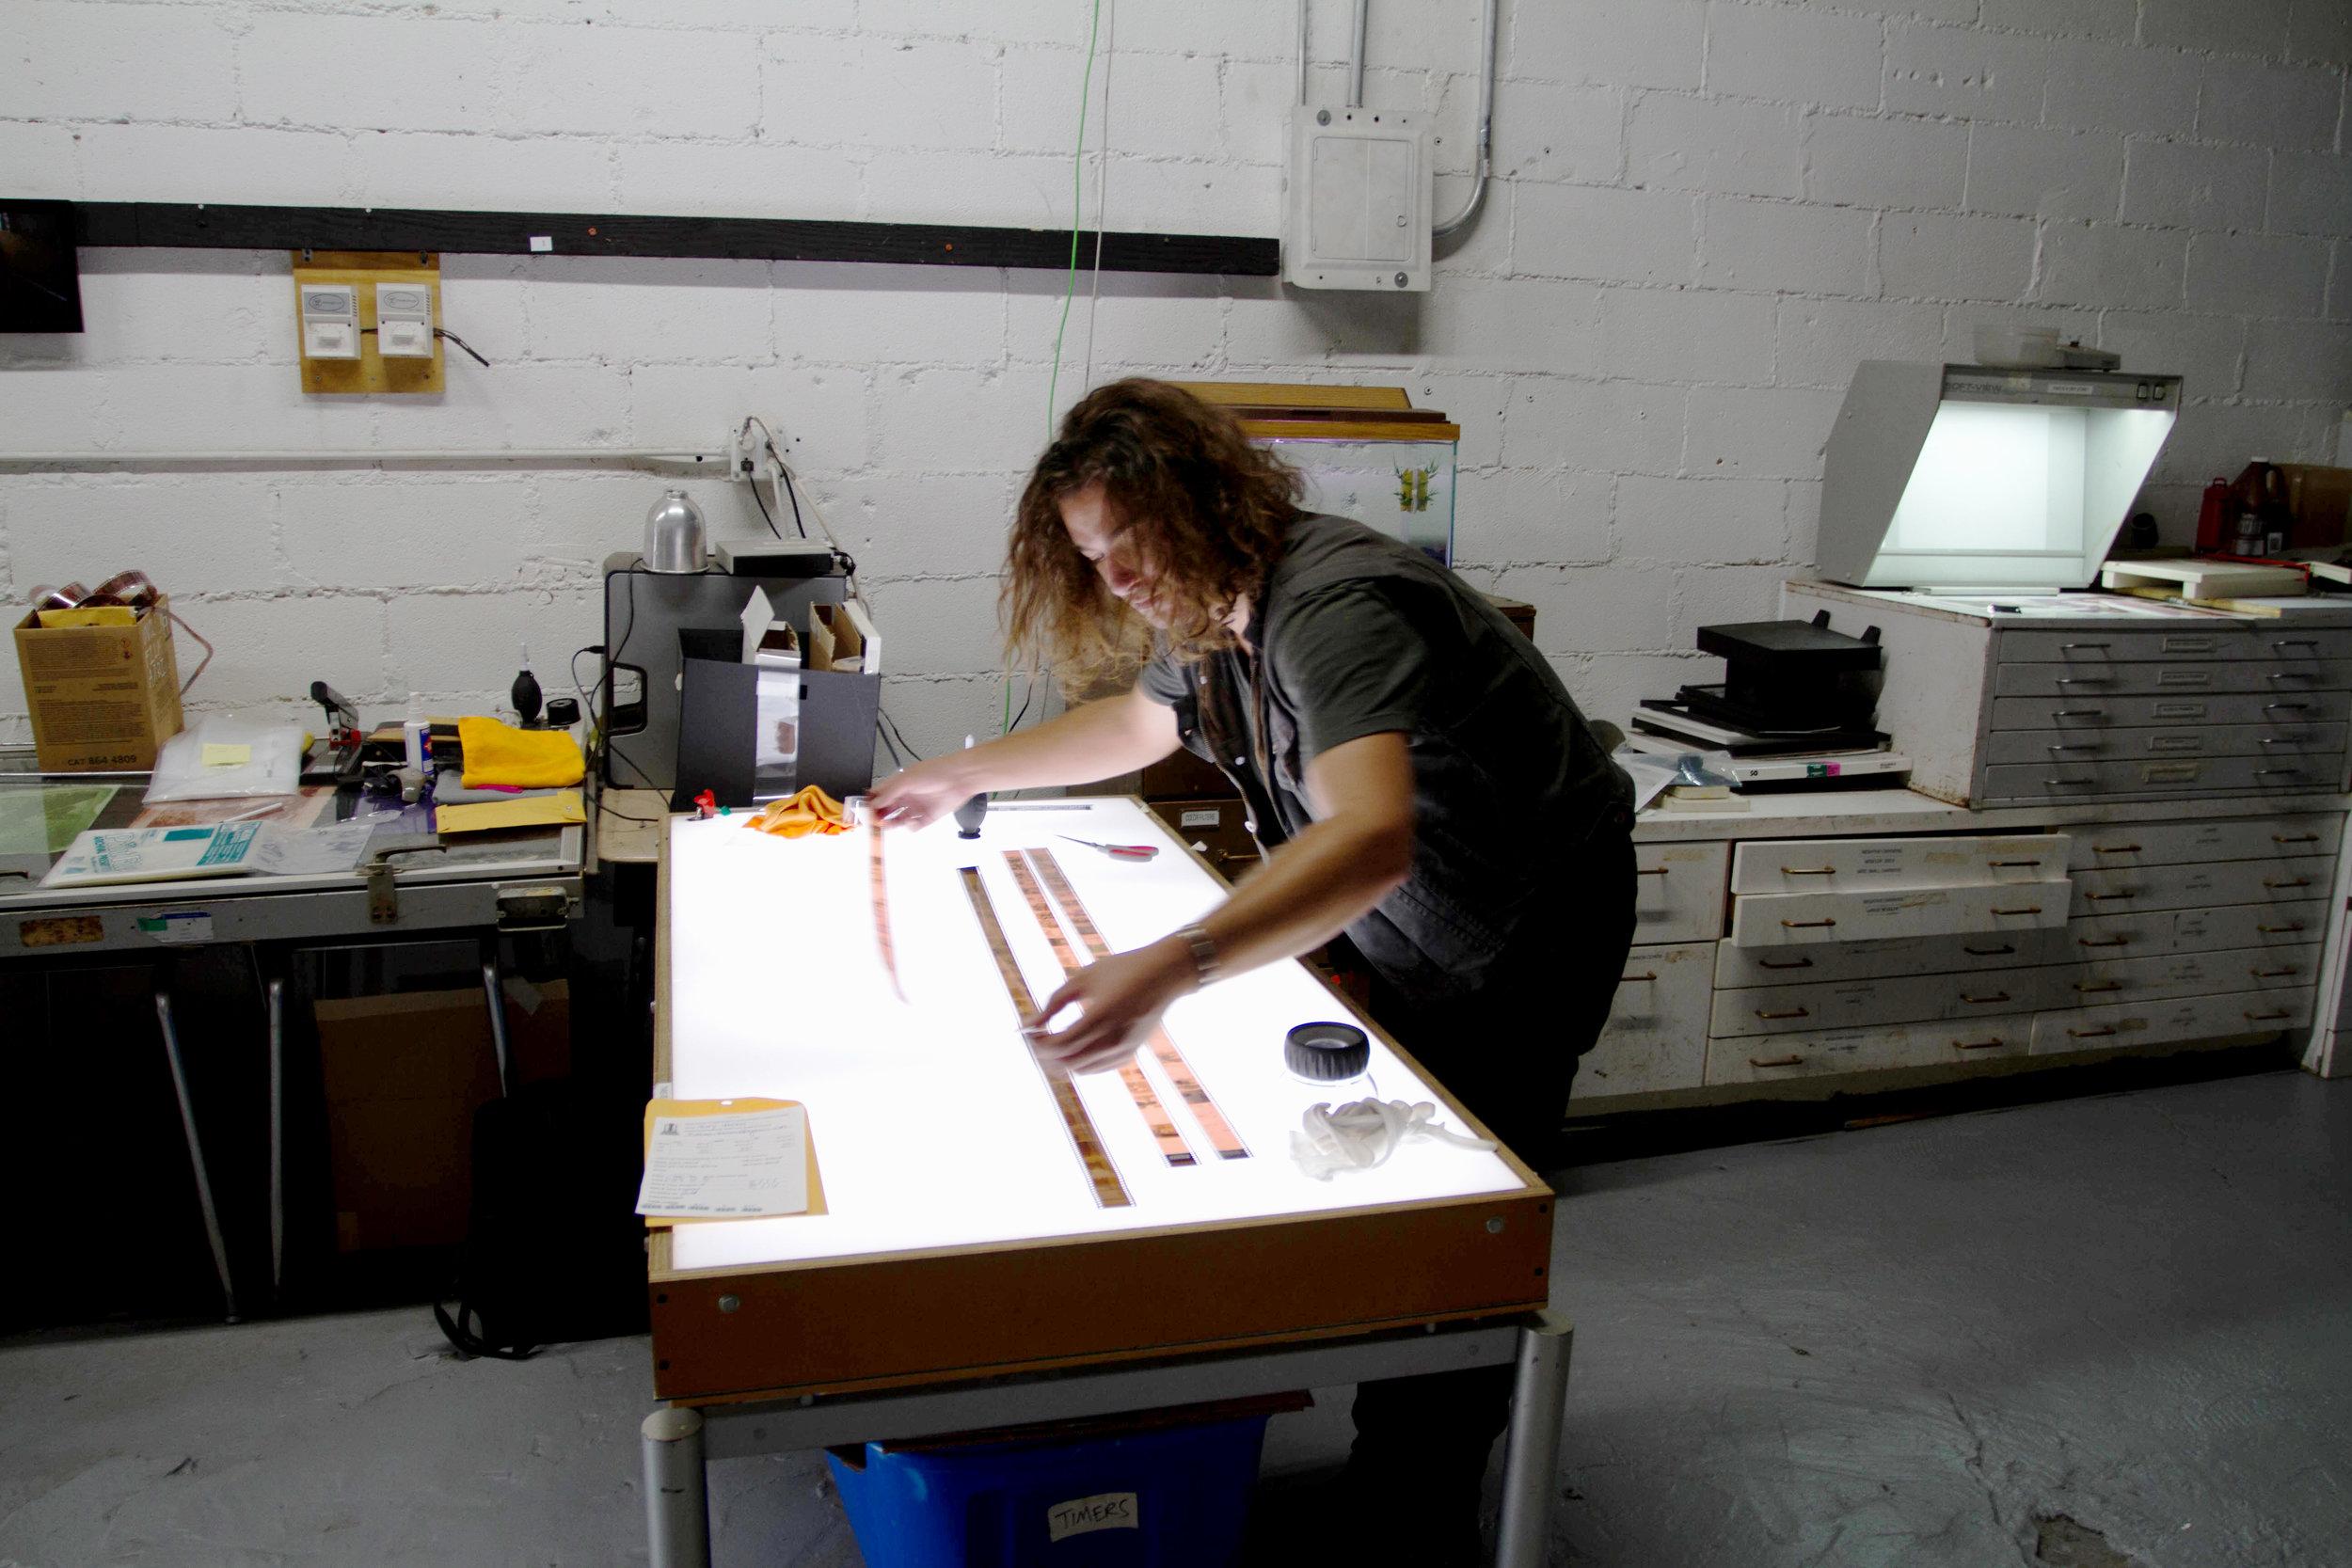 Volunteer Jon inspects some film